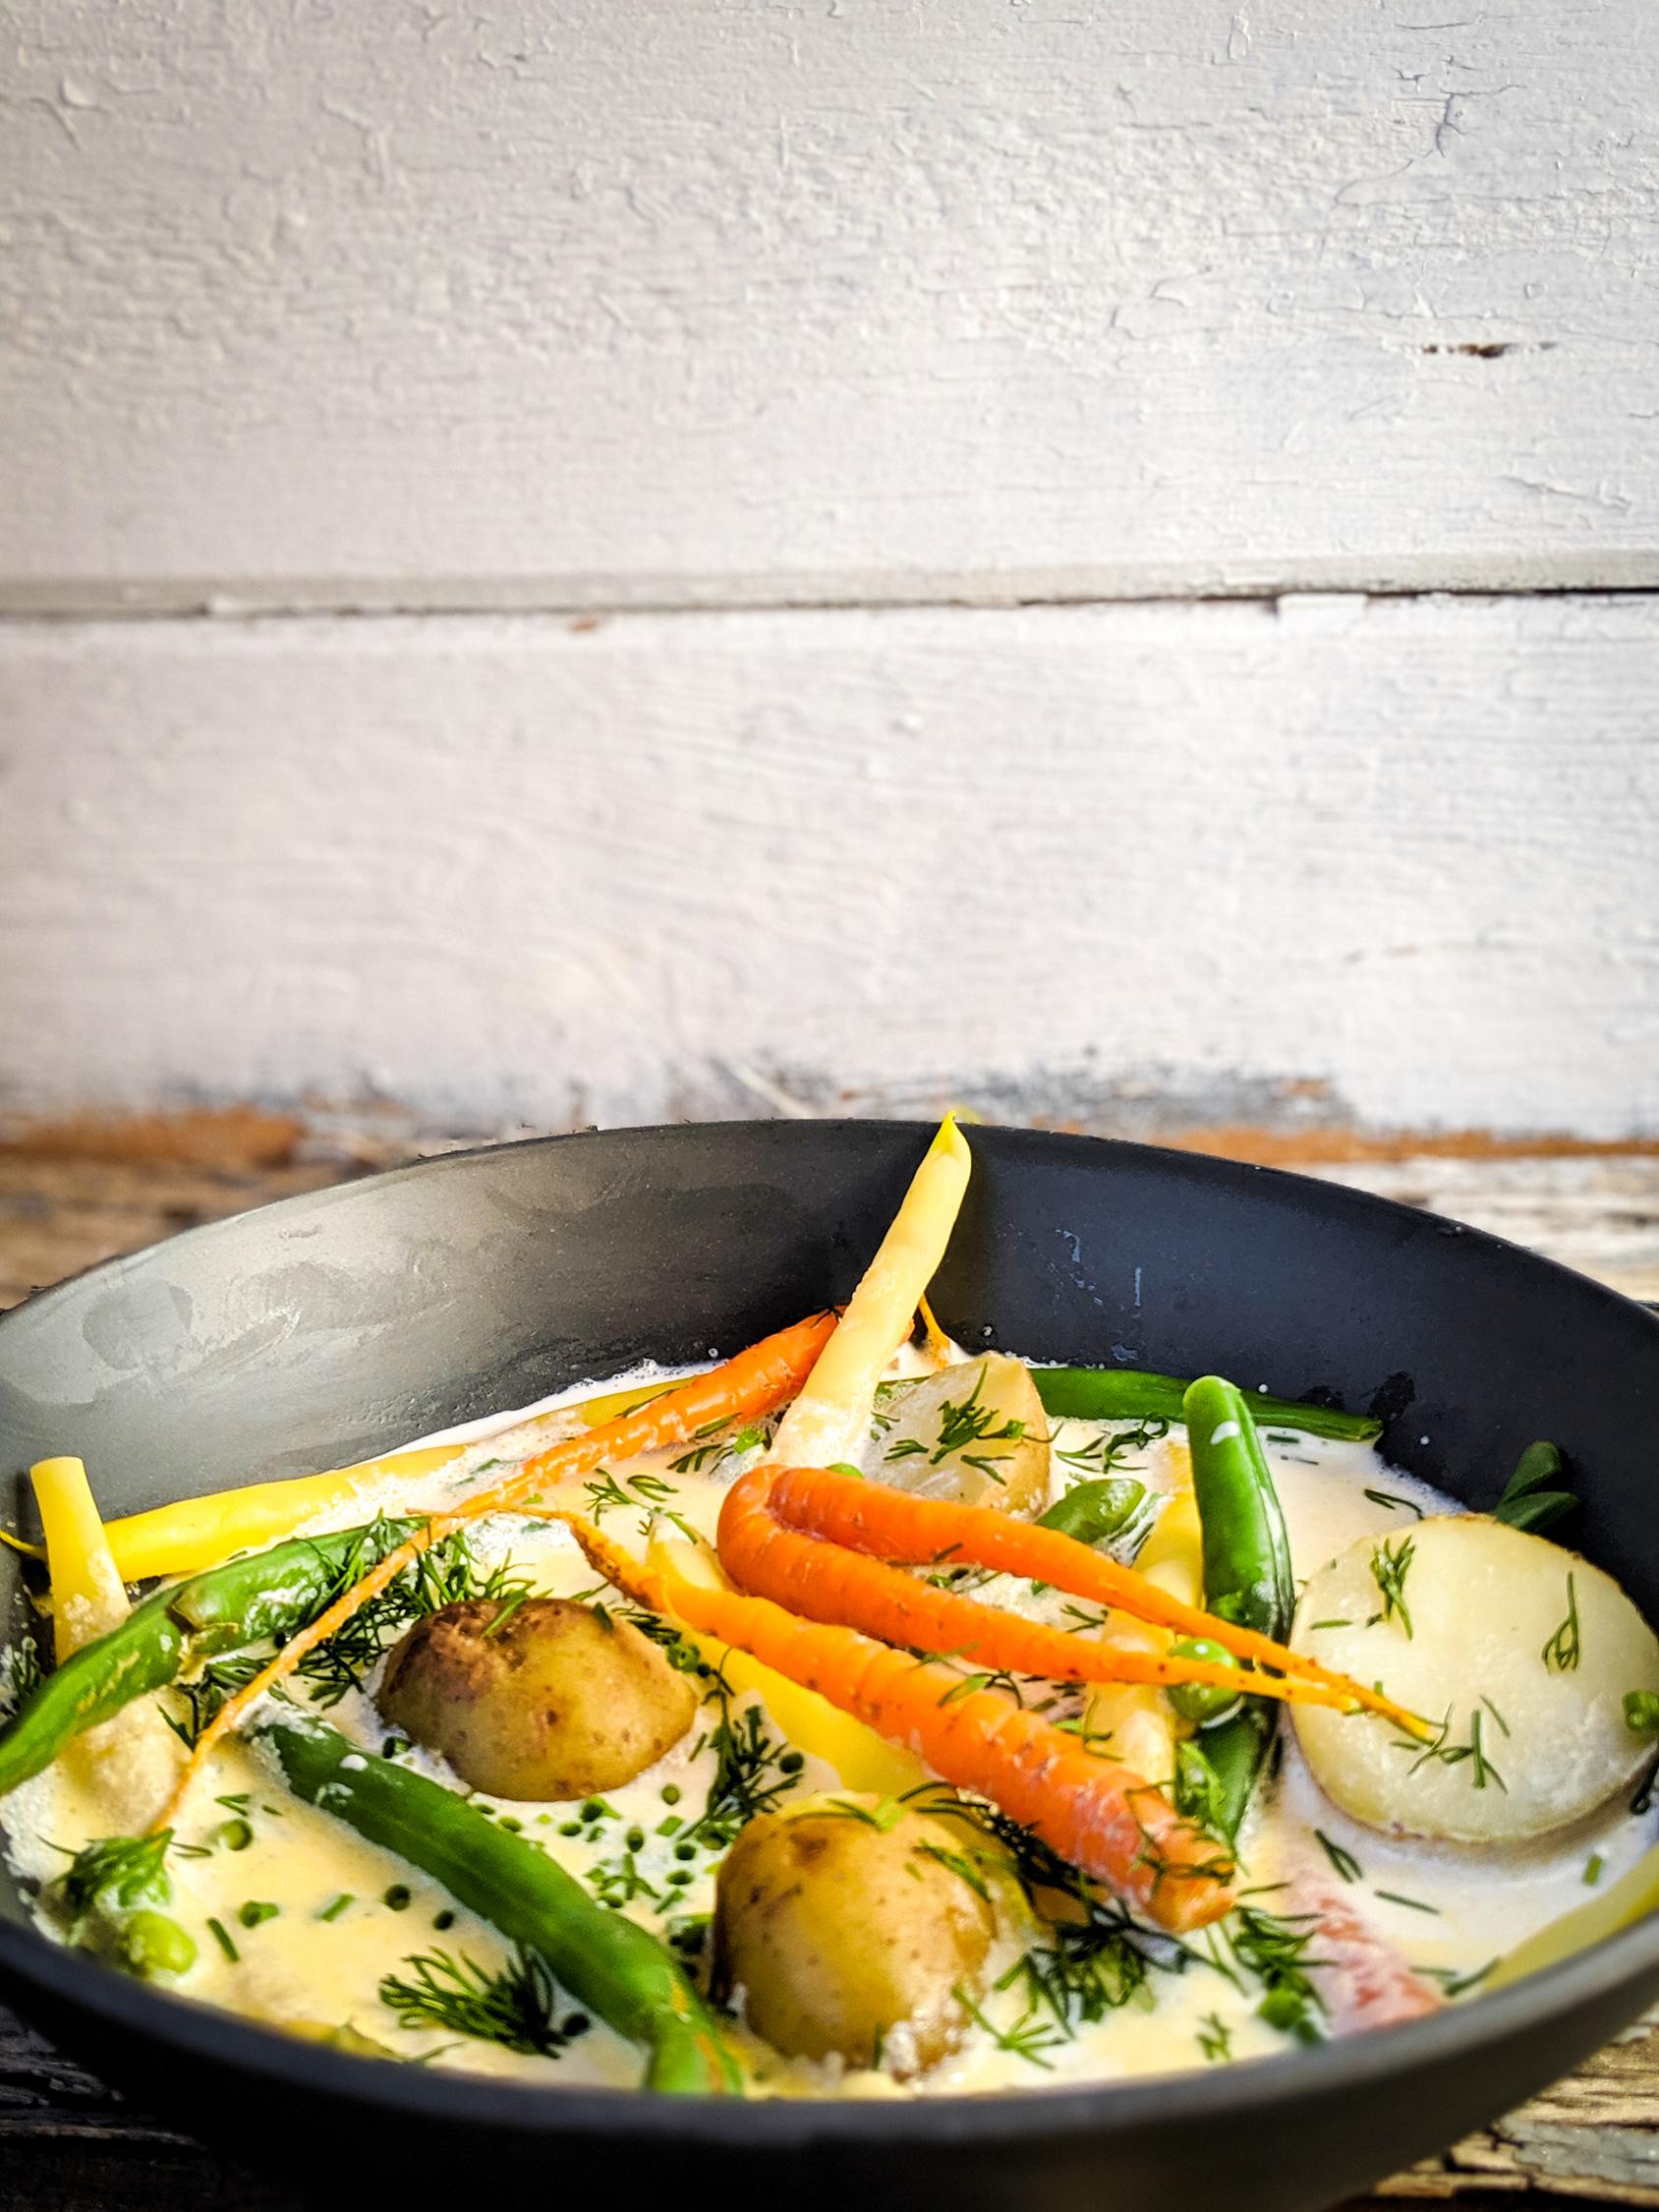 Nova Scotian hodge podge vegetable chowder in a blue bowl.